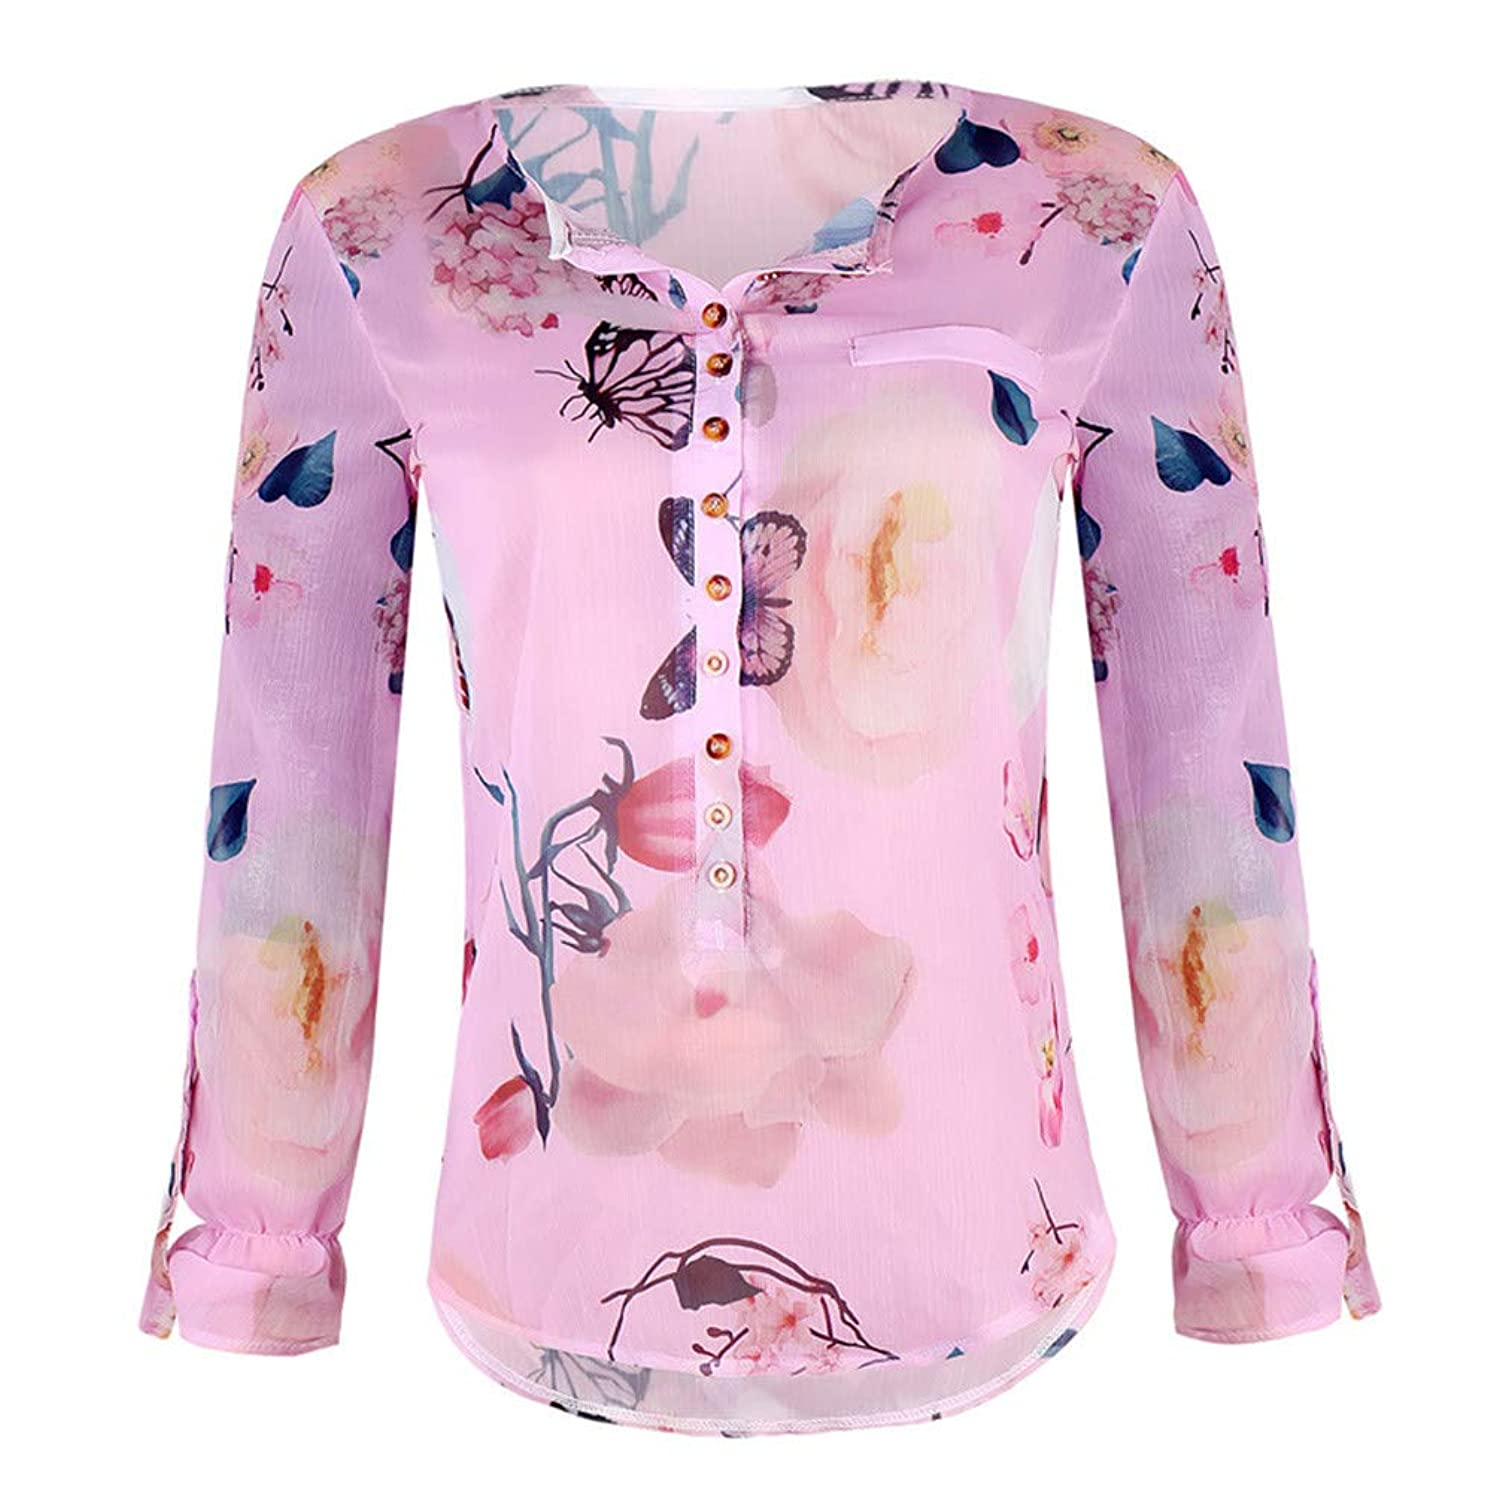 UONQD Women Floral Printed Button T-Shirt Chiffon Irregular Hem Top Plus Size